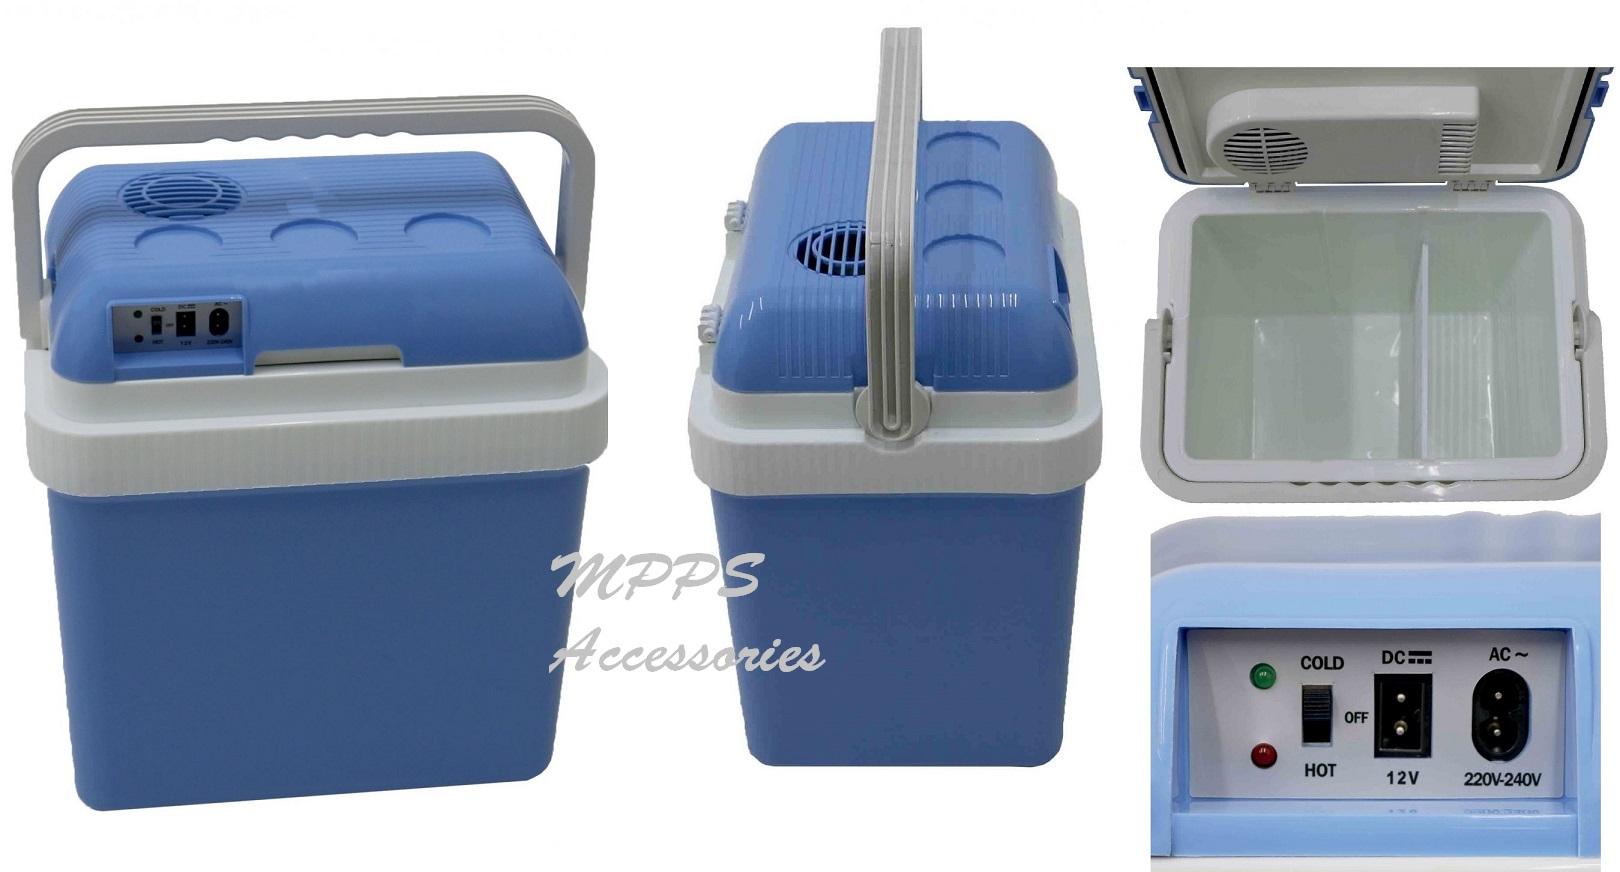 3f8a1bb54a7 24L 240V AC   12V DC Coolbox Hot Cold Portable Electric Cool Box